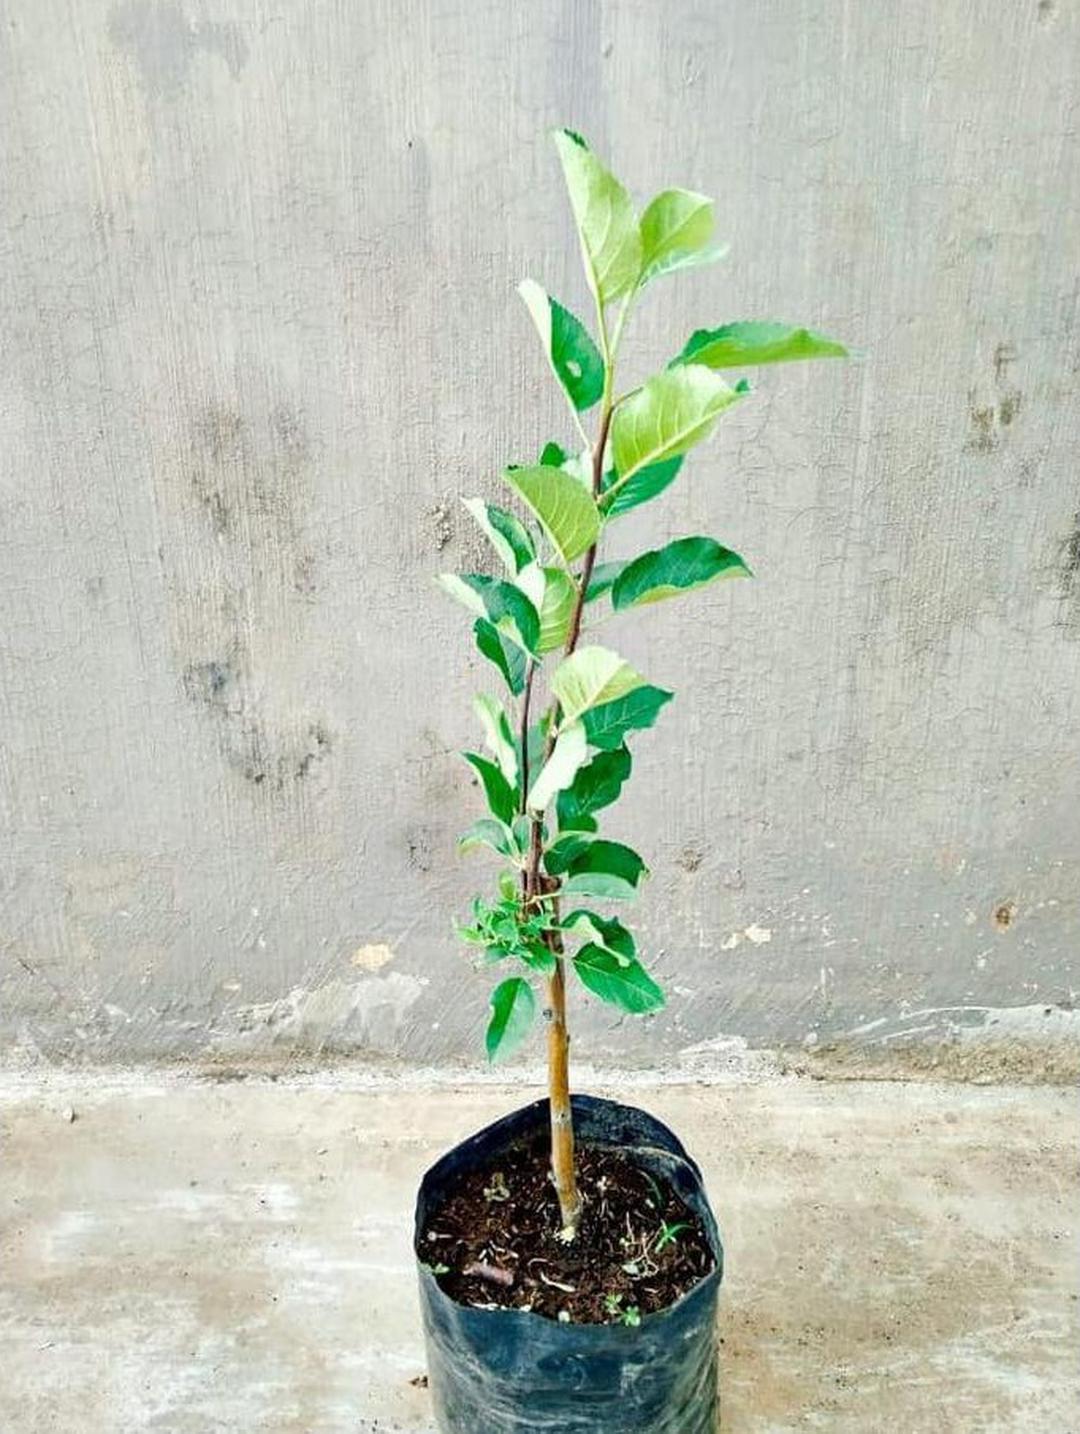 Stok banyak! Pohon Apel Anna Tanaman Buah Apple Ana Malang Bibit Stella Unggul Kota Jakarta #bibit buah langka